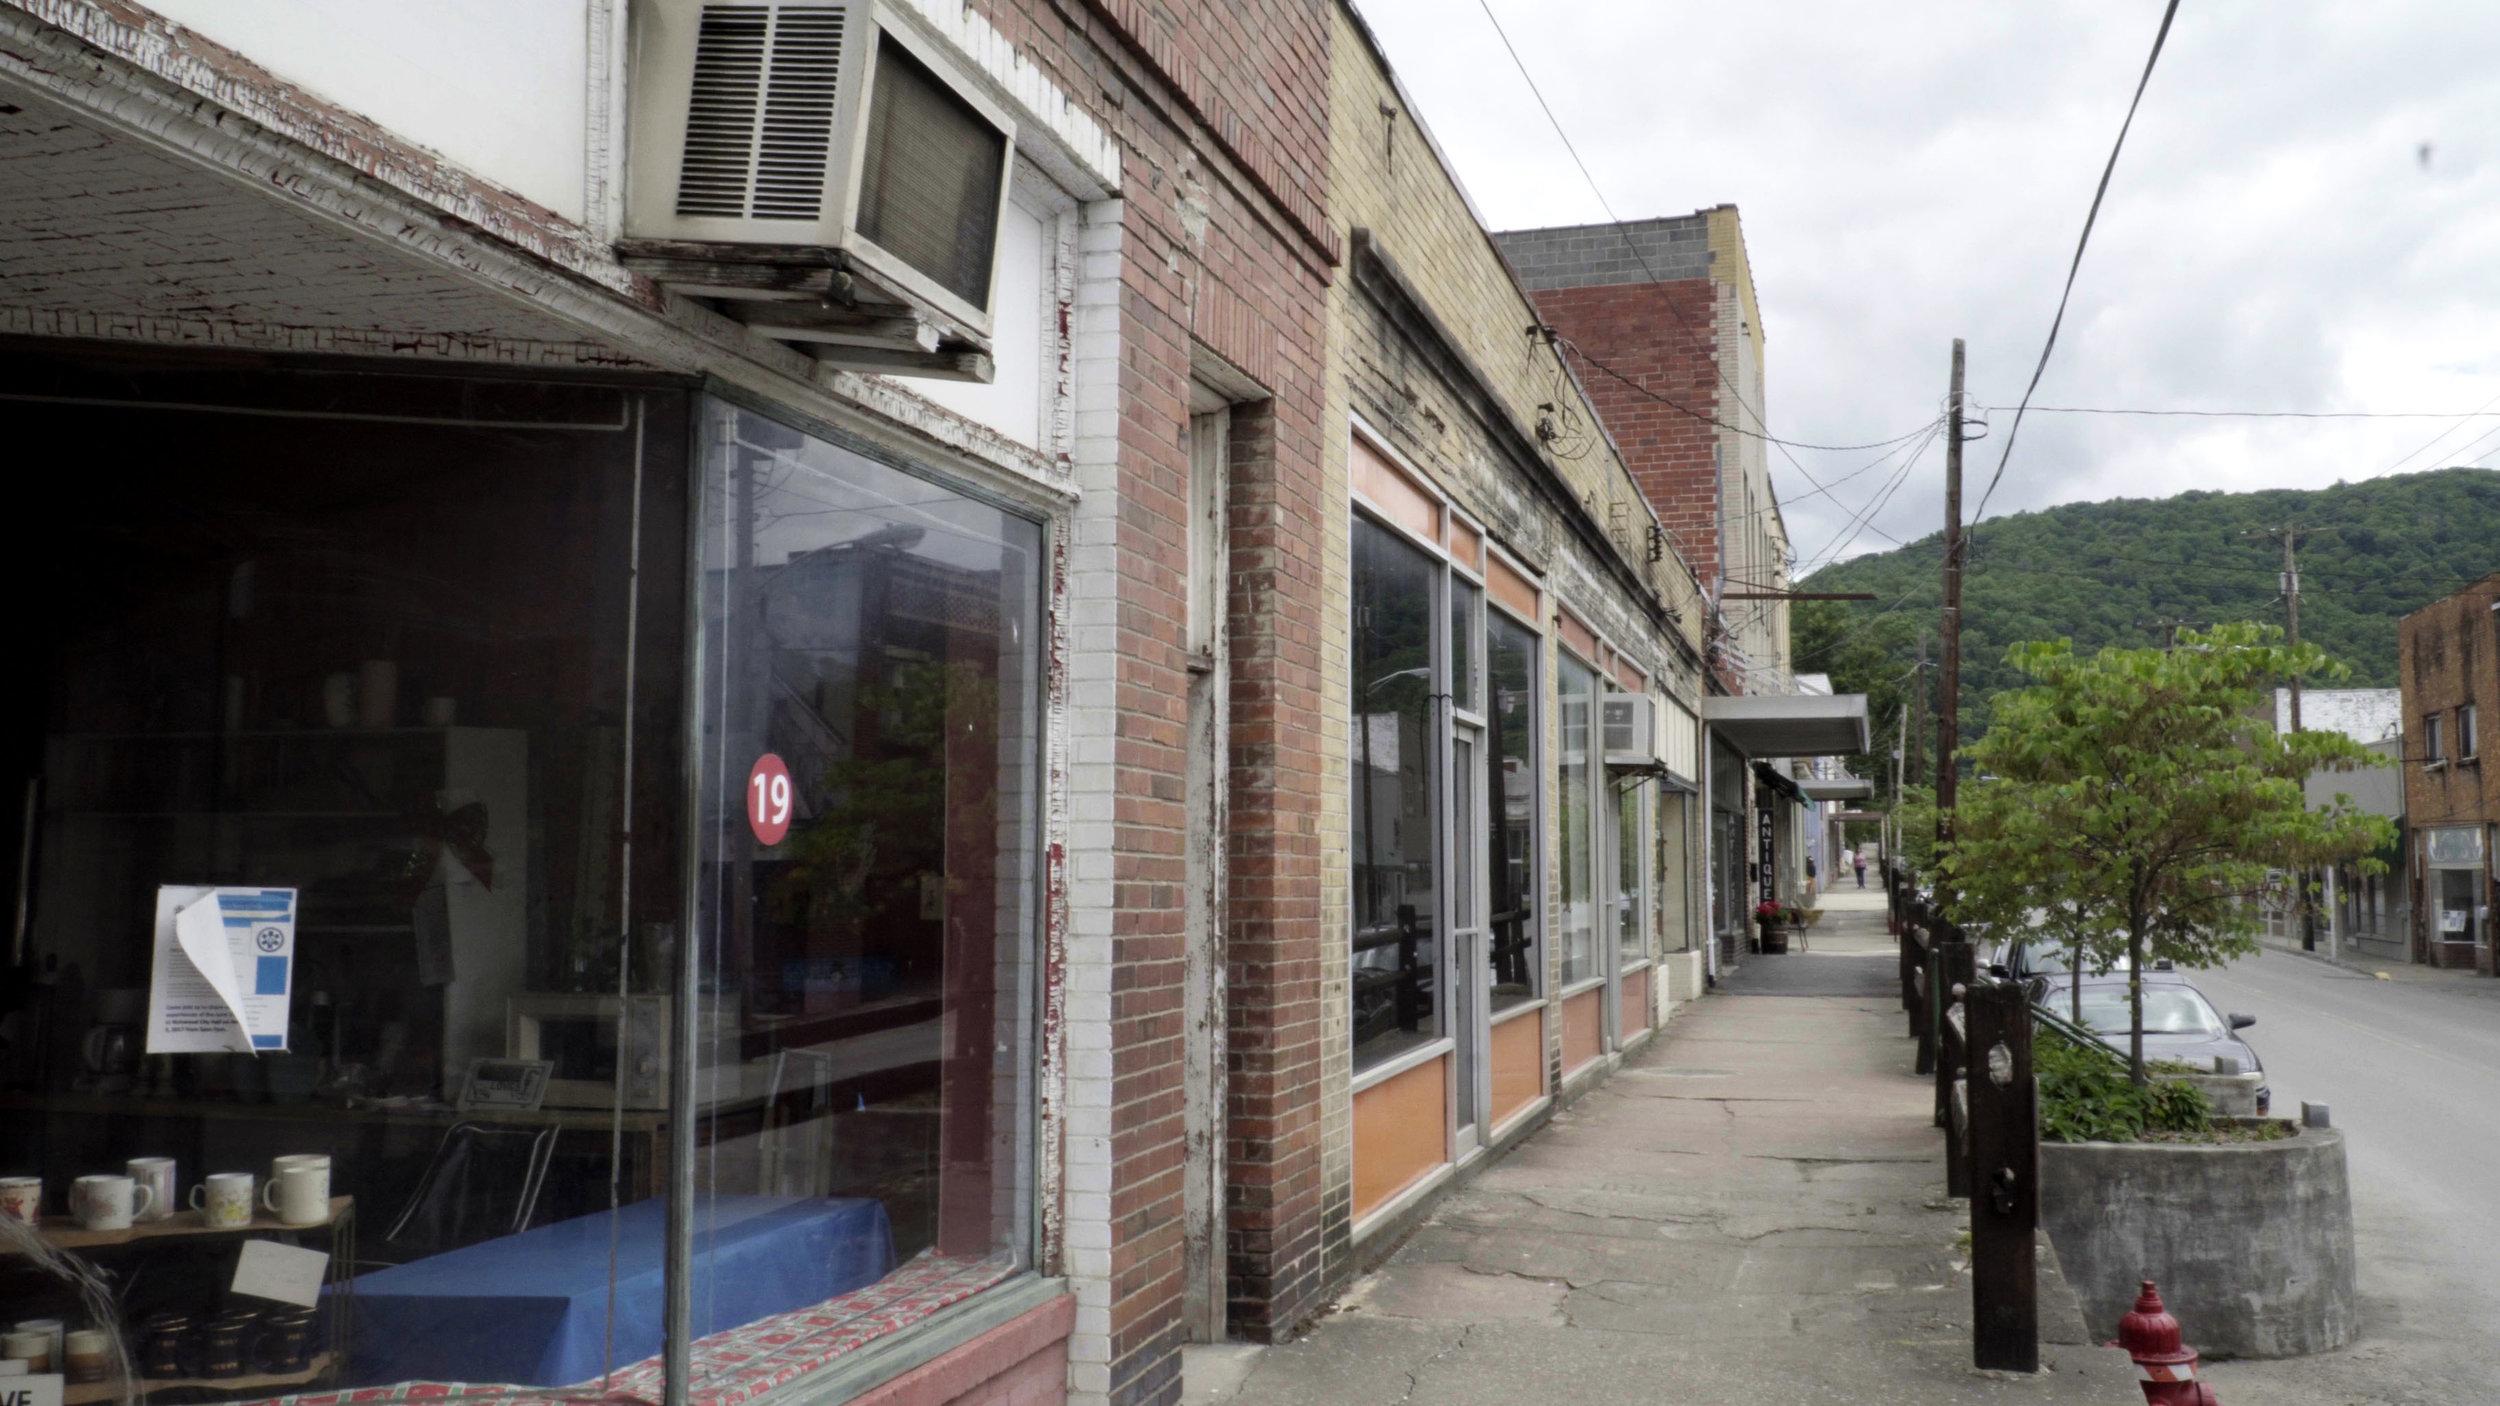 AbandonedStorefronts2_Richwood.jpg